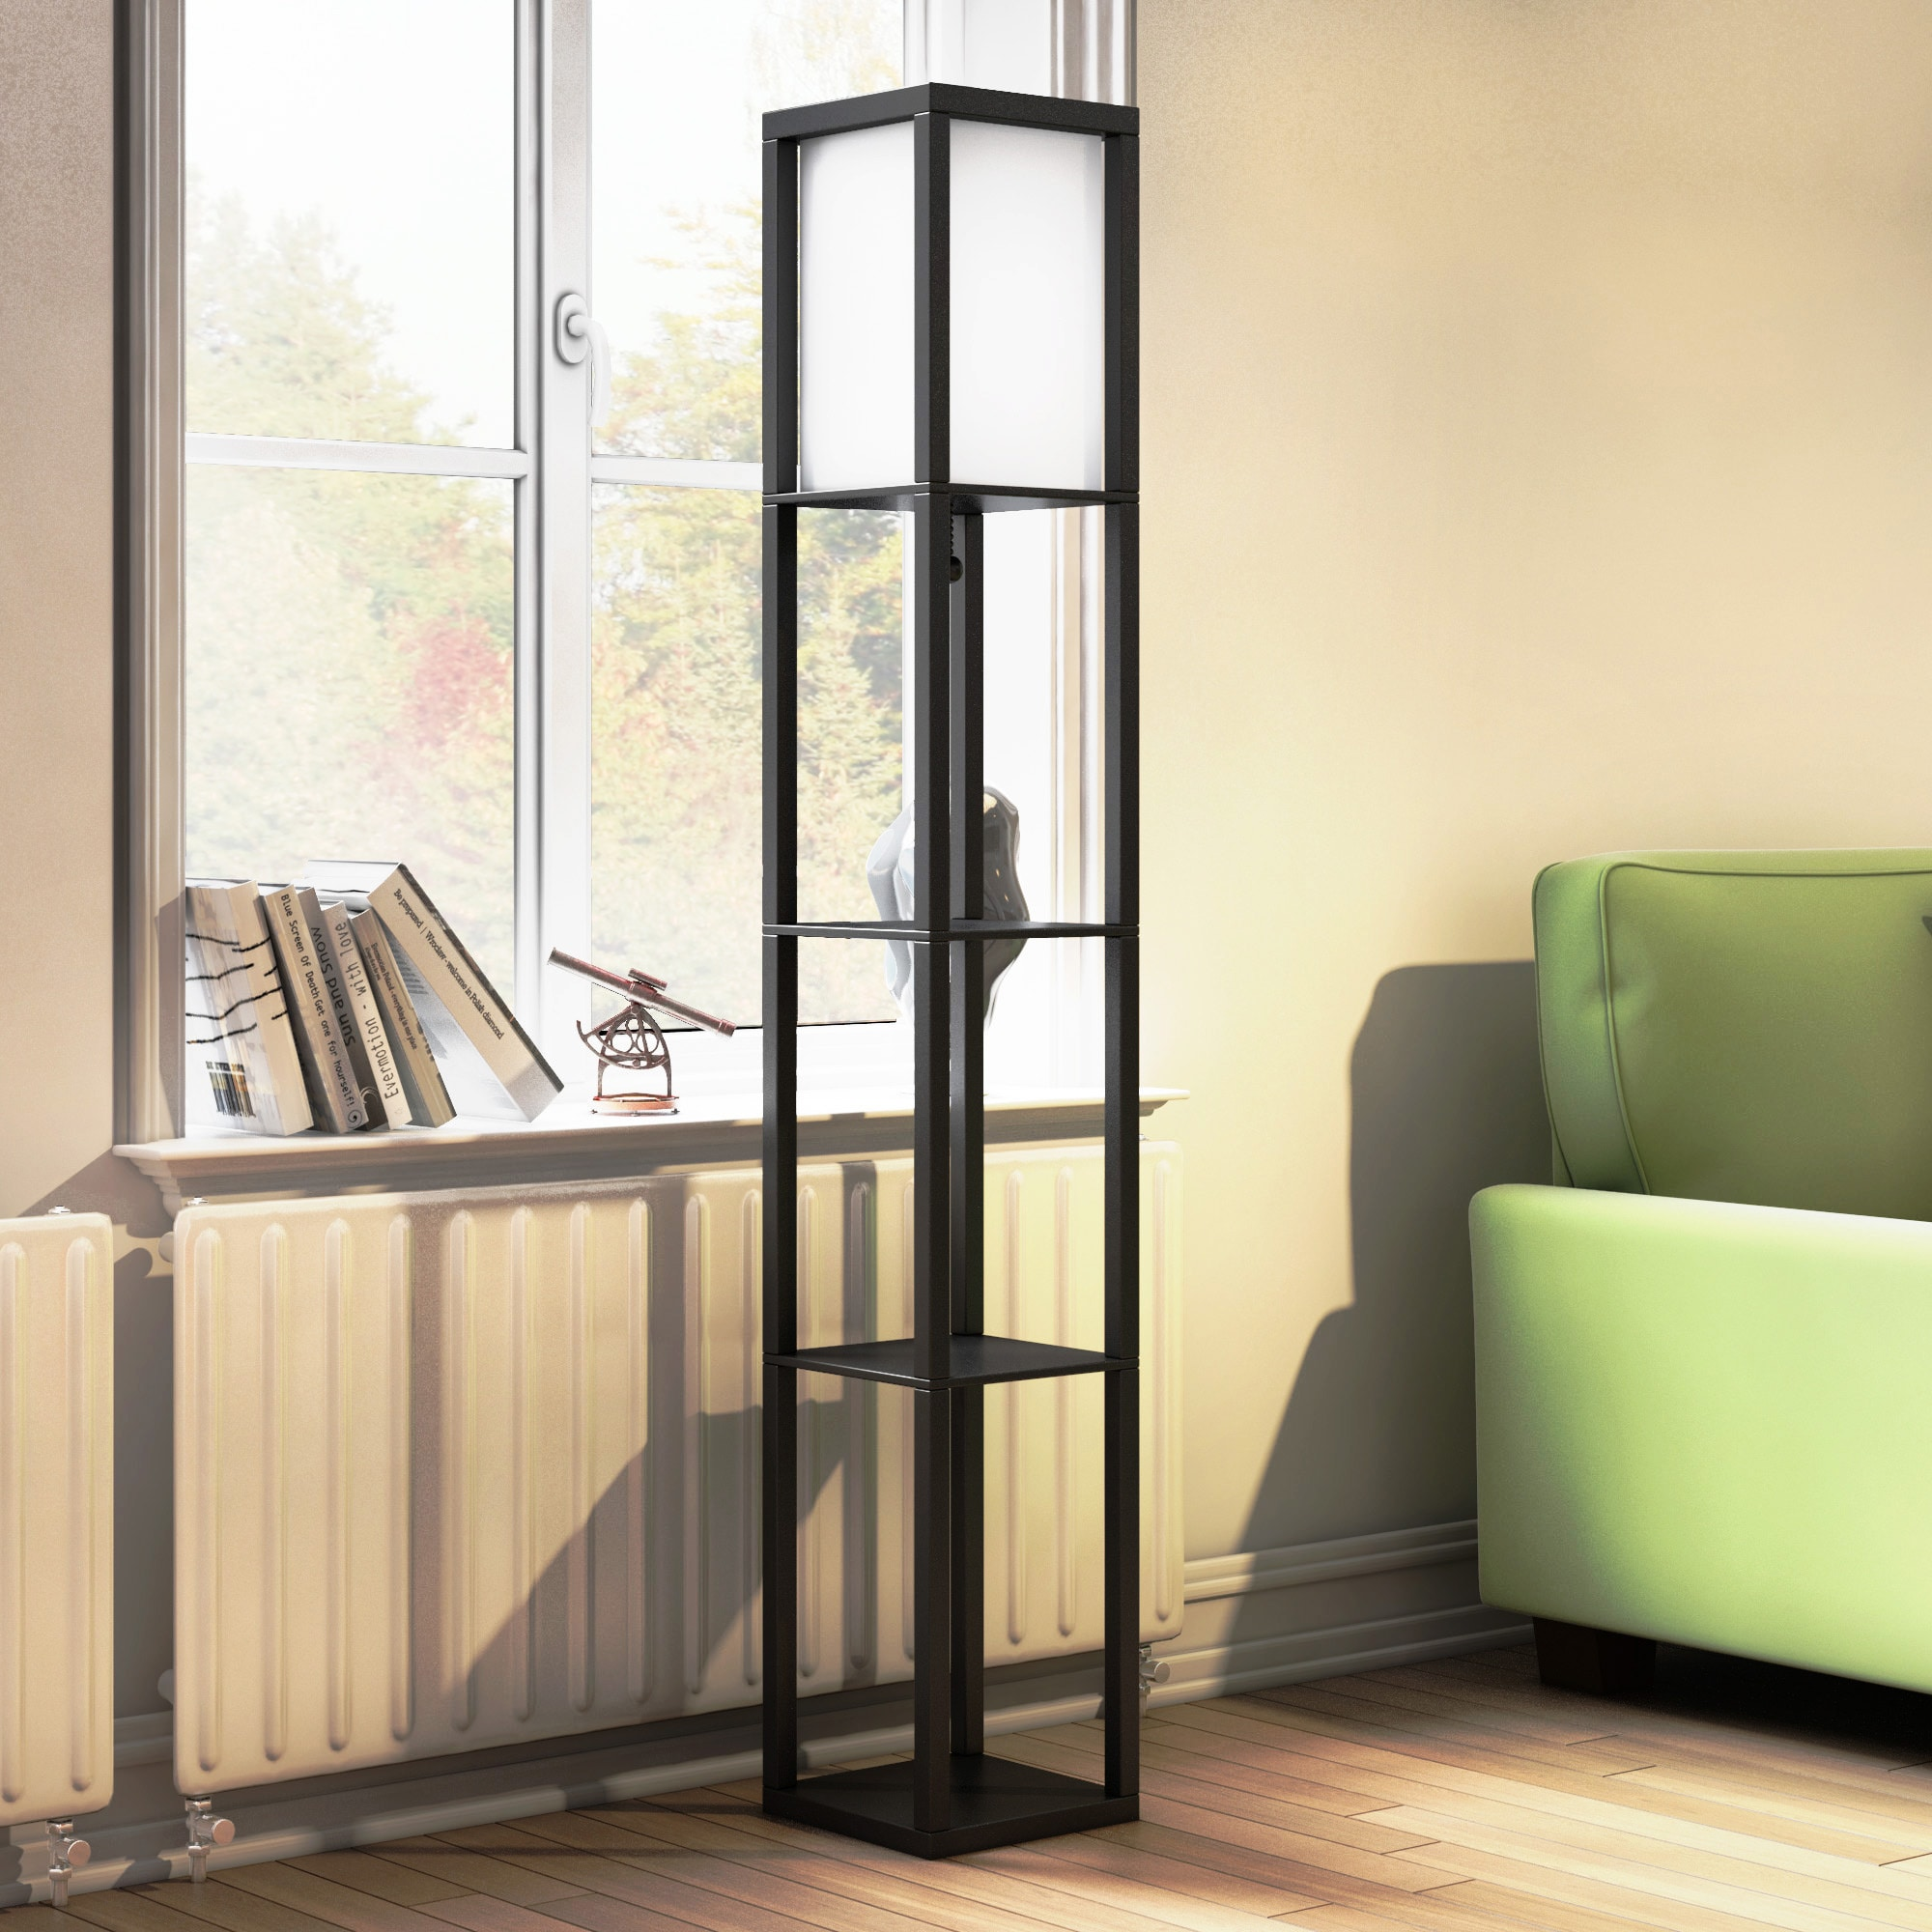 shelf base with shelves and lamp animal floor decoration lamps decofurnish glass